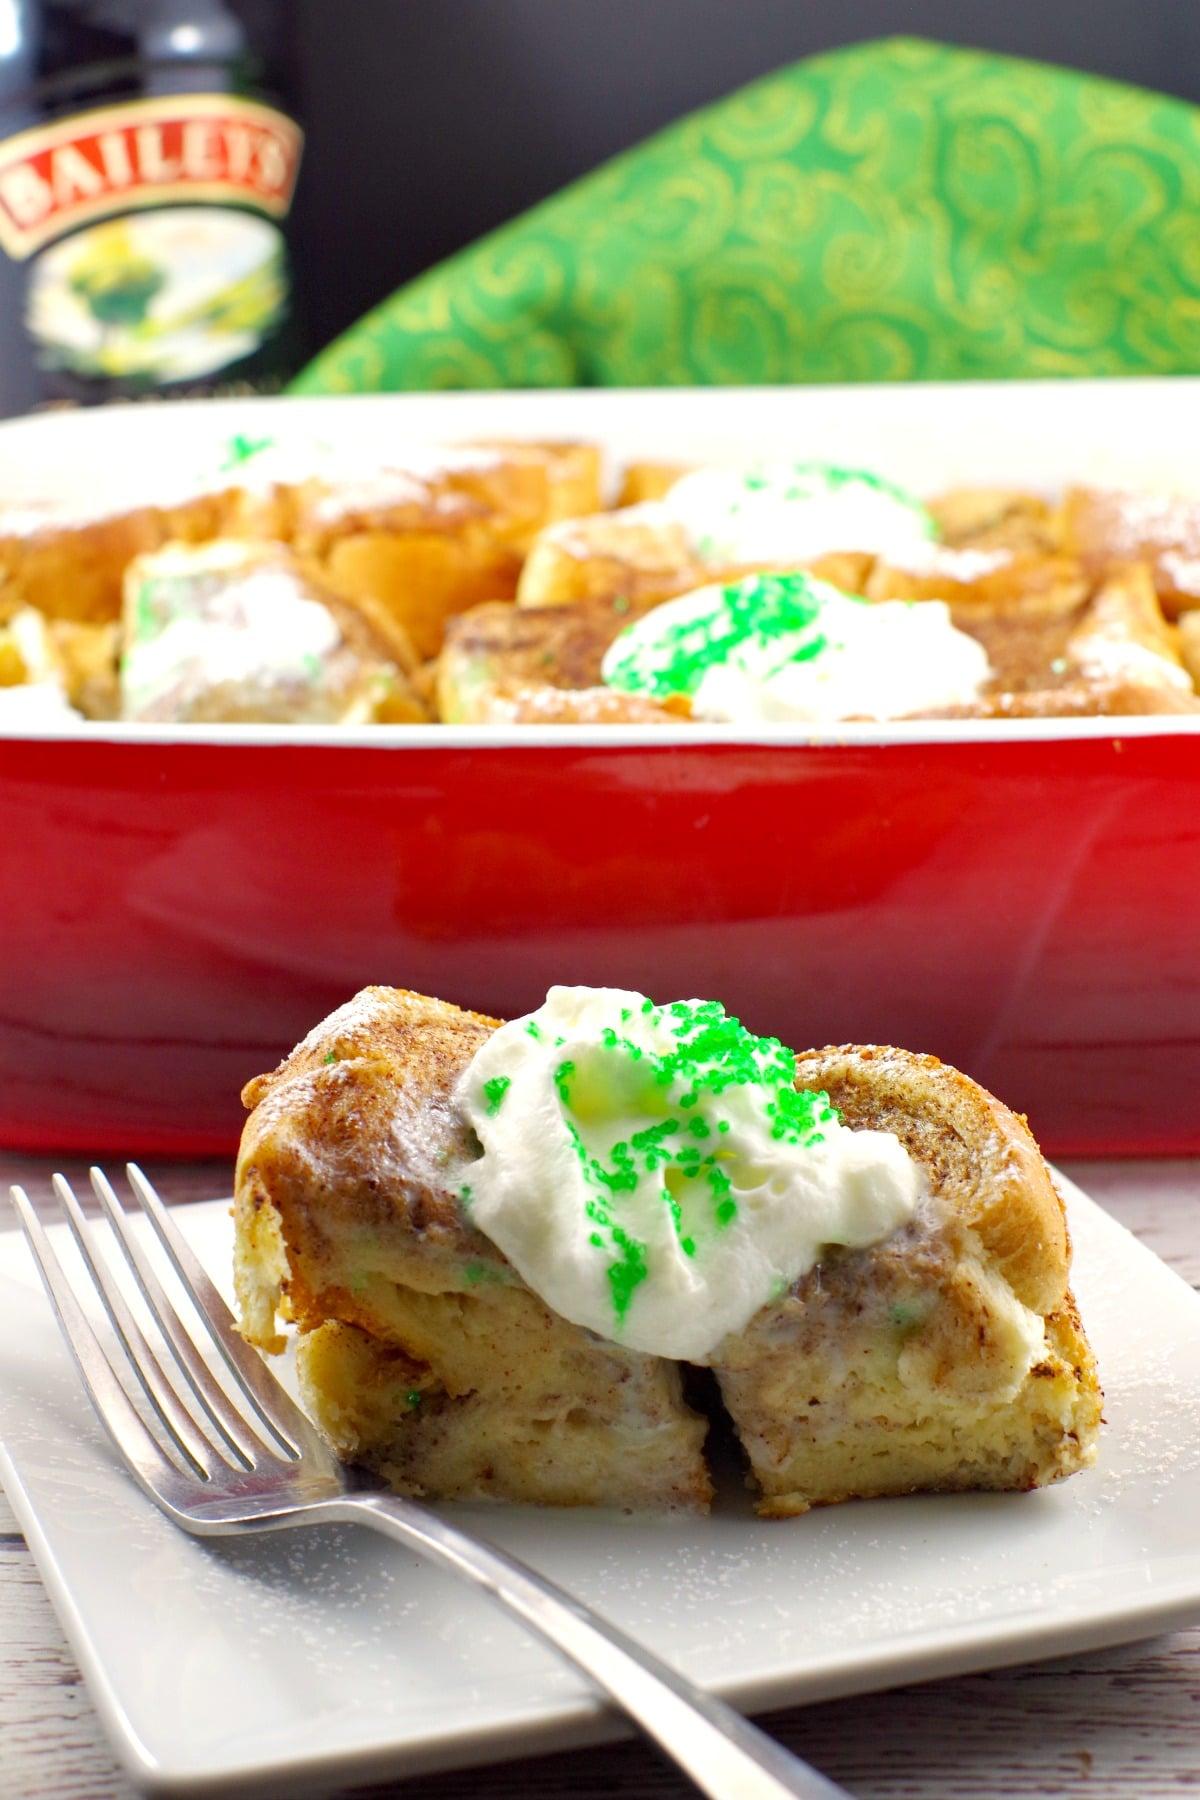 Best overnight french toast casserole - Bailey's Irish Cream St. Patrick's Day